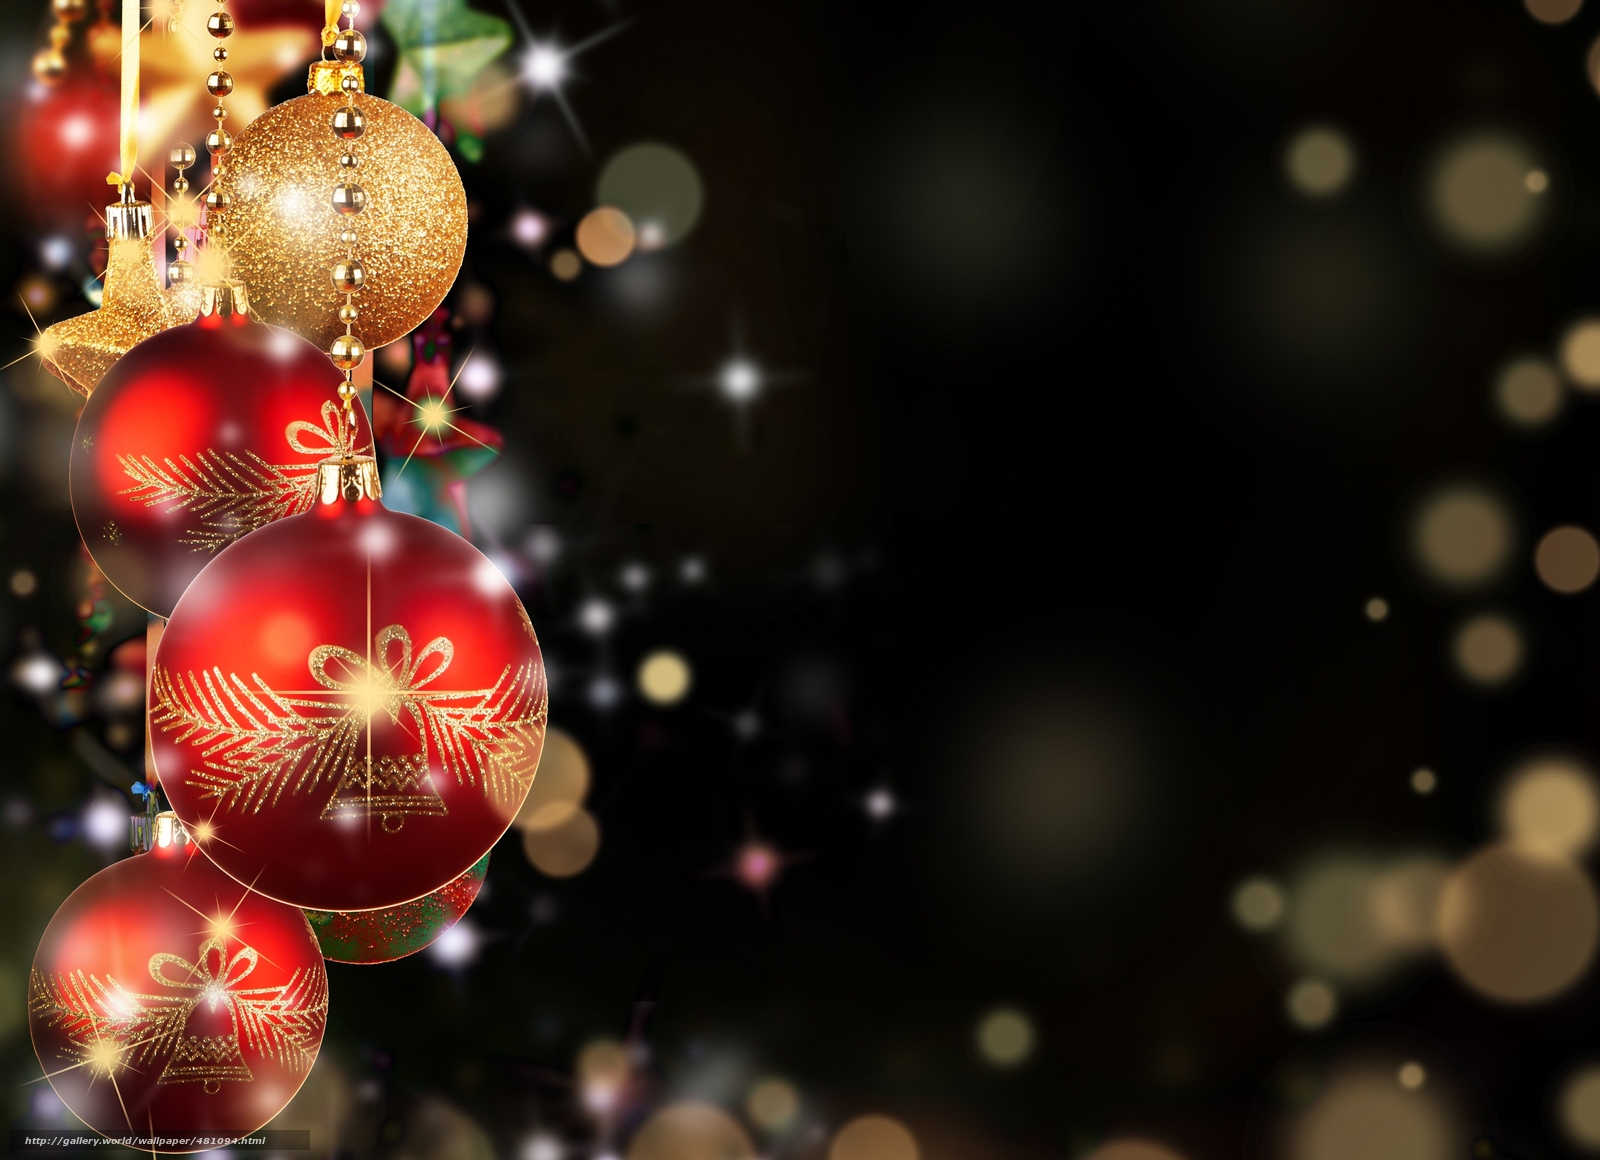 download wallpaper balls red gold christmas free. Black Bedroom Furniture Sets. Home Design Ideas